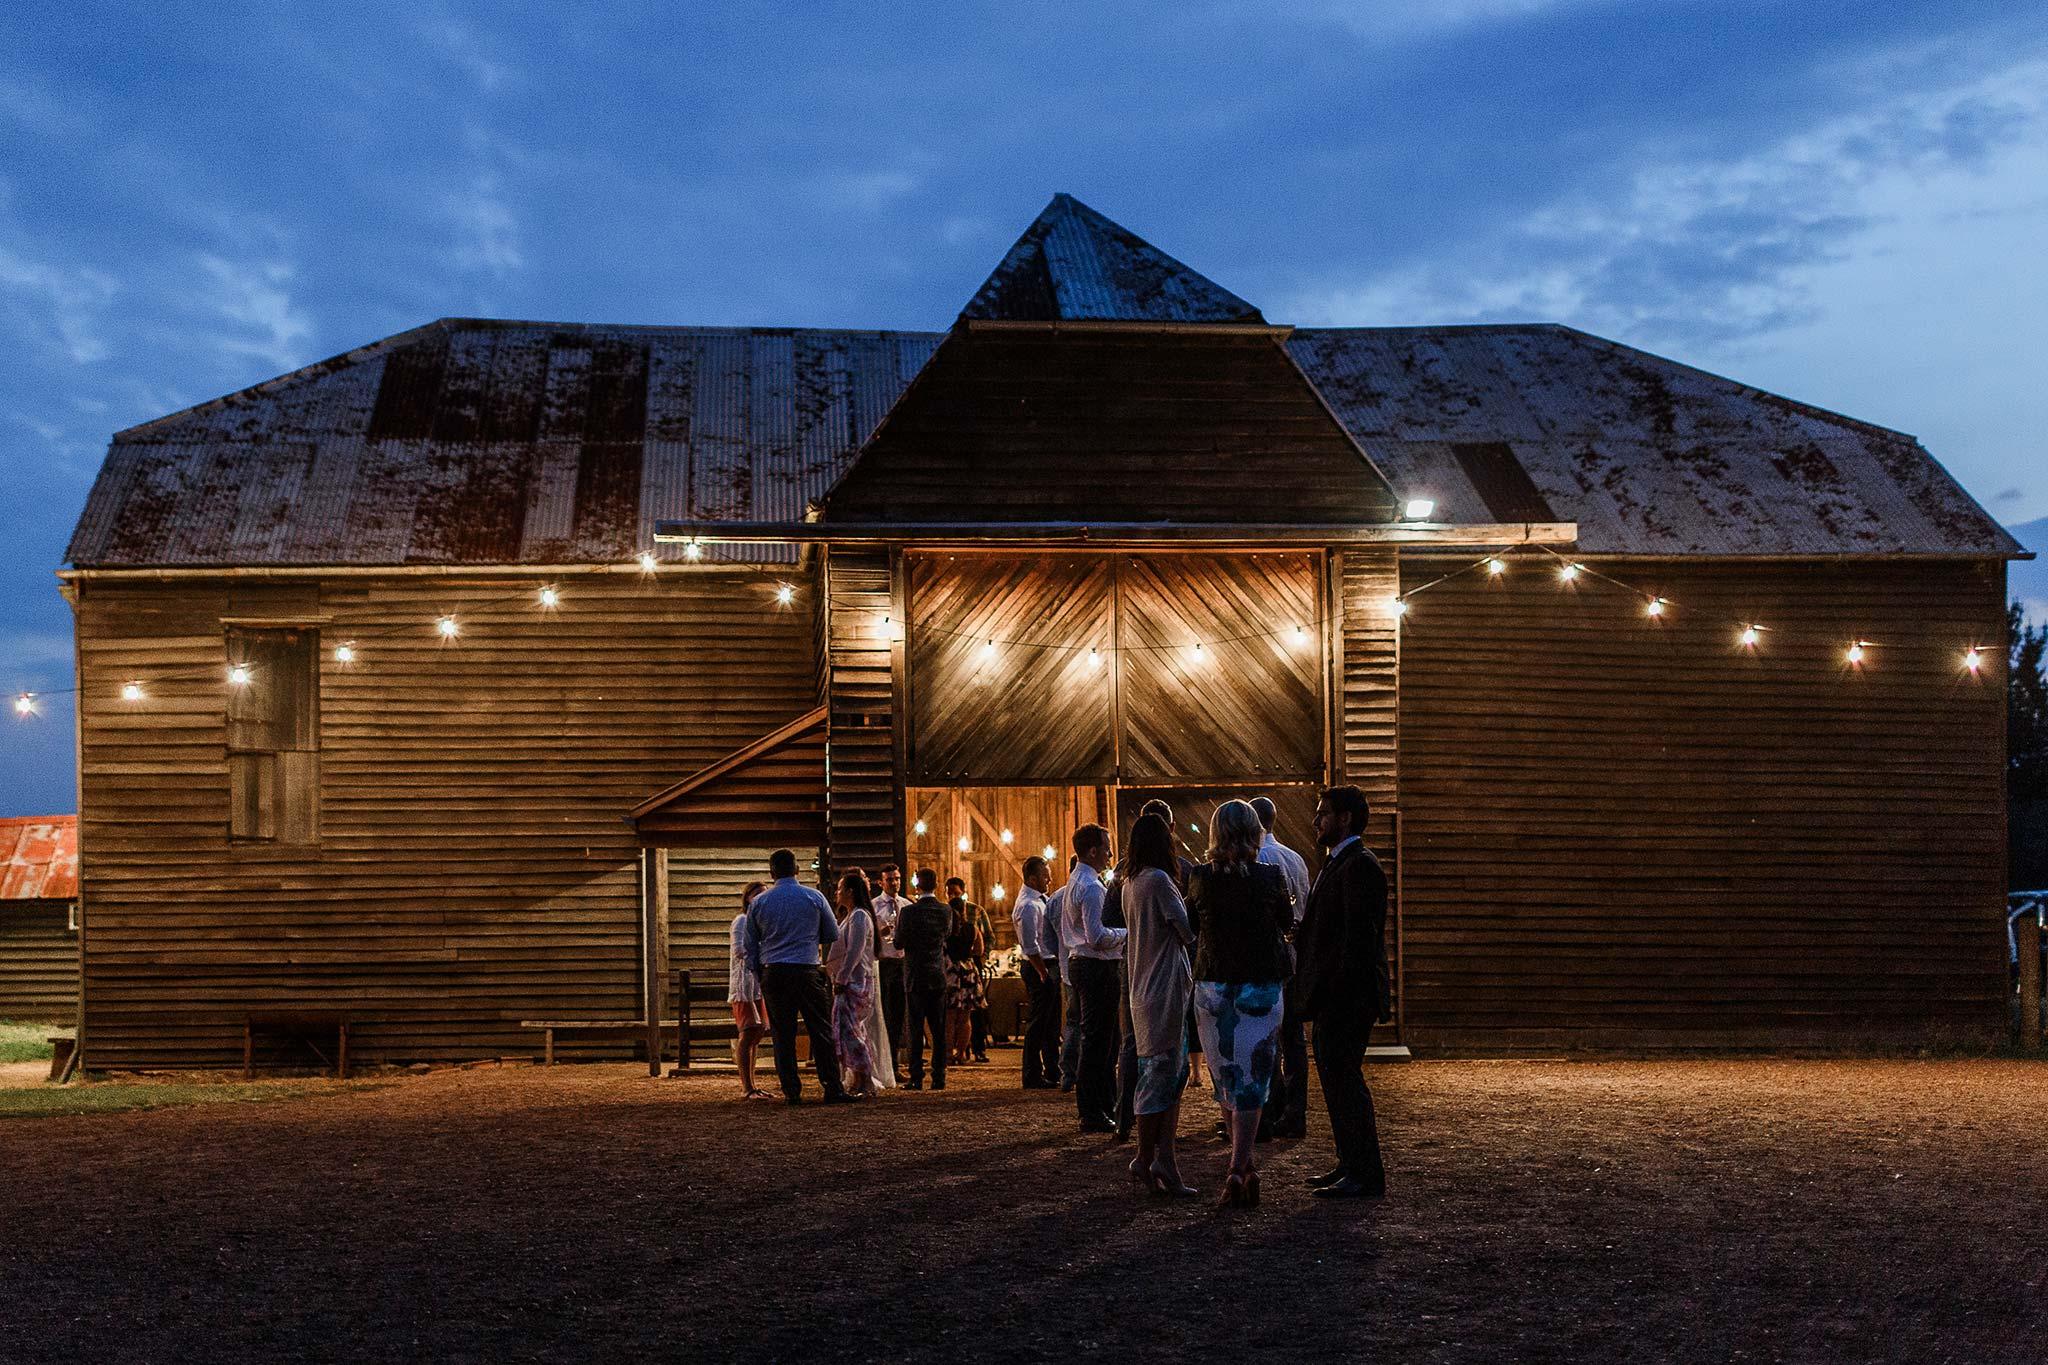 Launceston-Brickendon-barn-Wedding-Photographer-reception-night-view